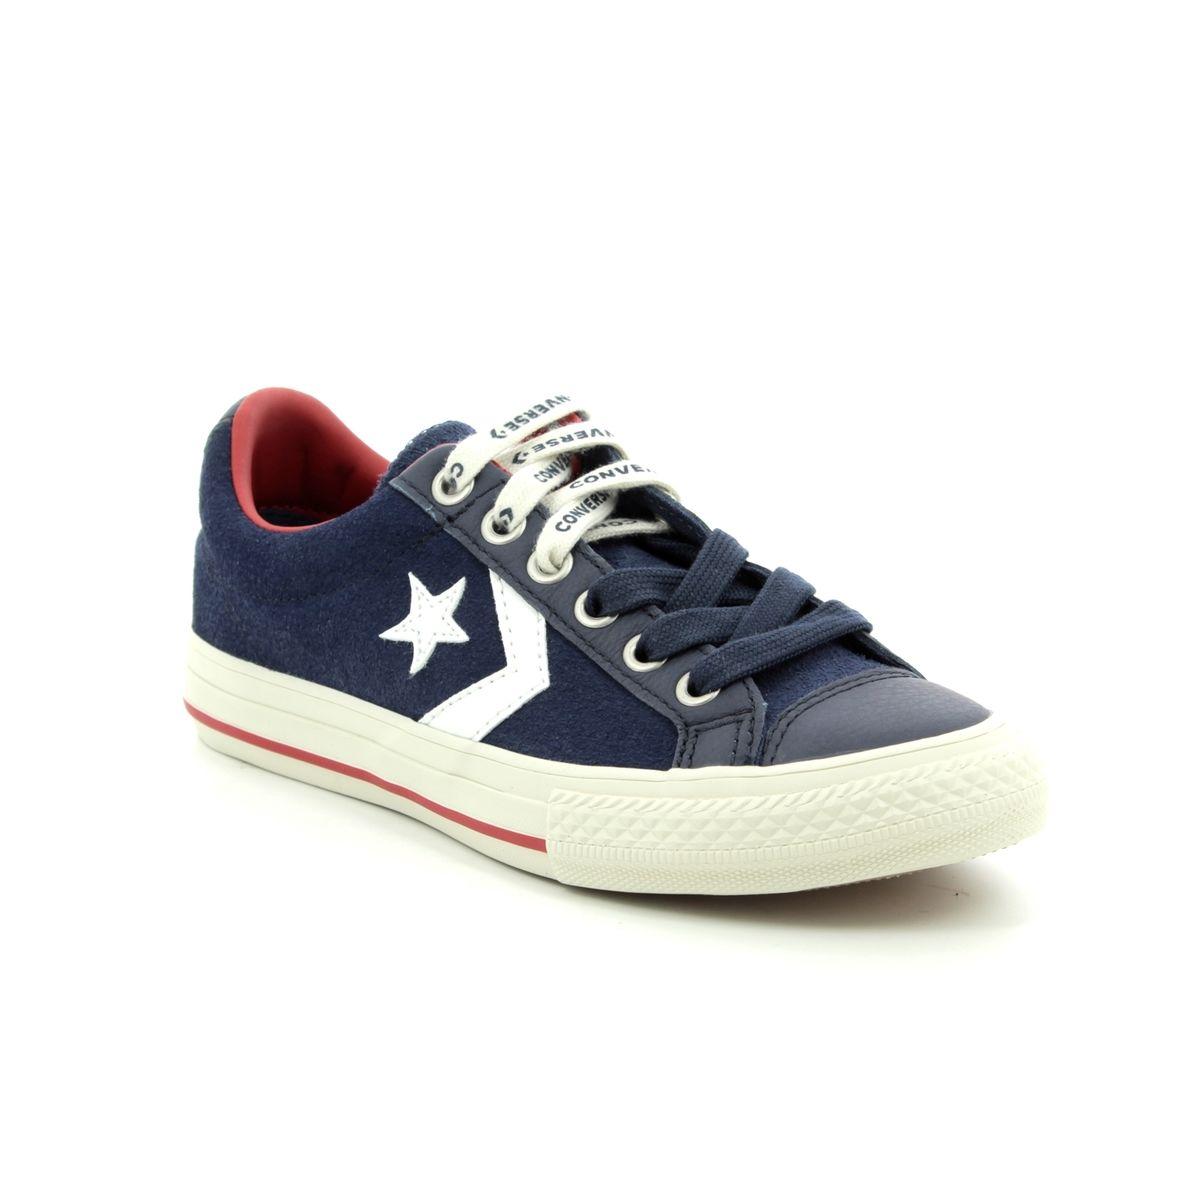 9076240dbd2e Converse Star Player Junior 662766C-70 Navy Suede Boys Trainers